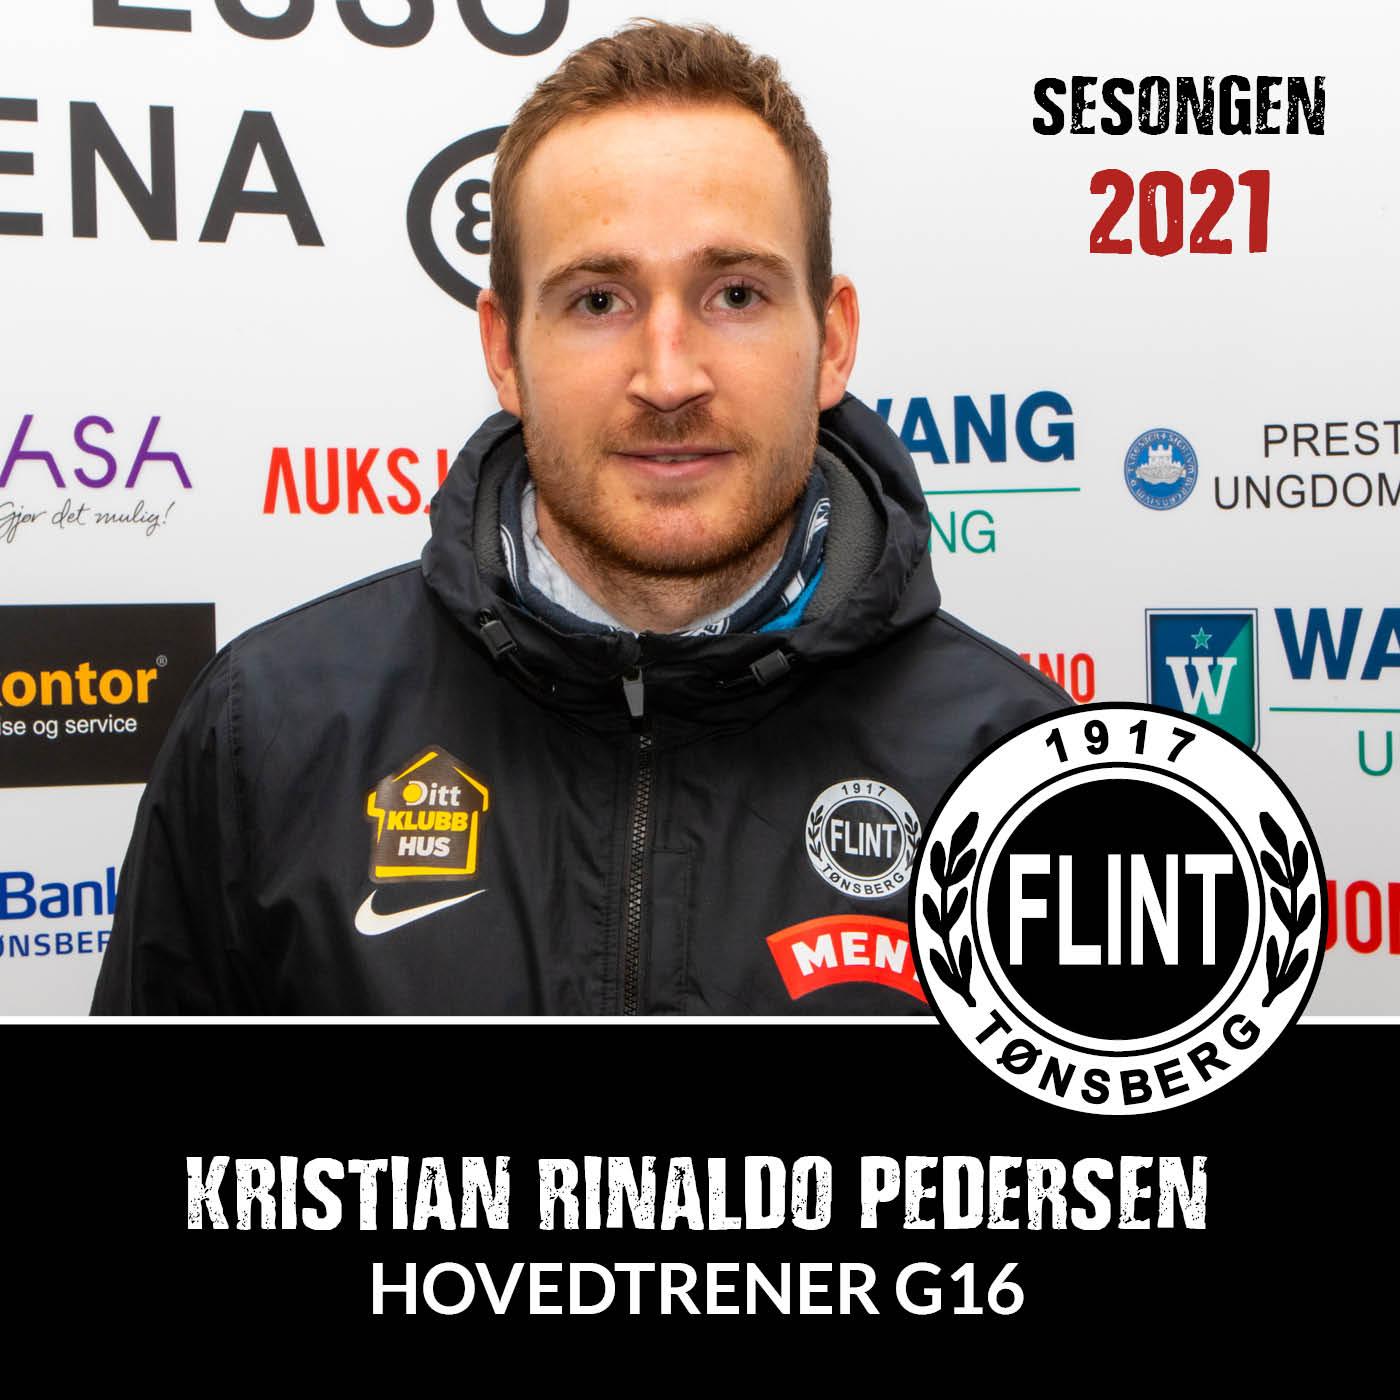 https://www.flintfotball.no/wp-content/uploads/2021/02/Trener-Kristian-Rinaldo-Pedersen.jpg